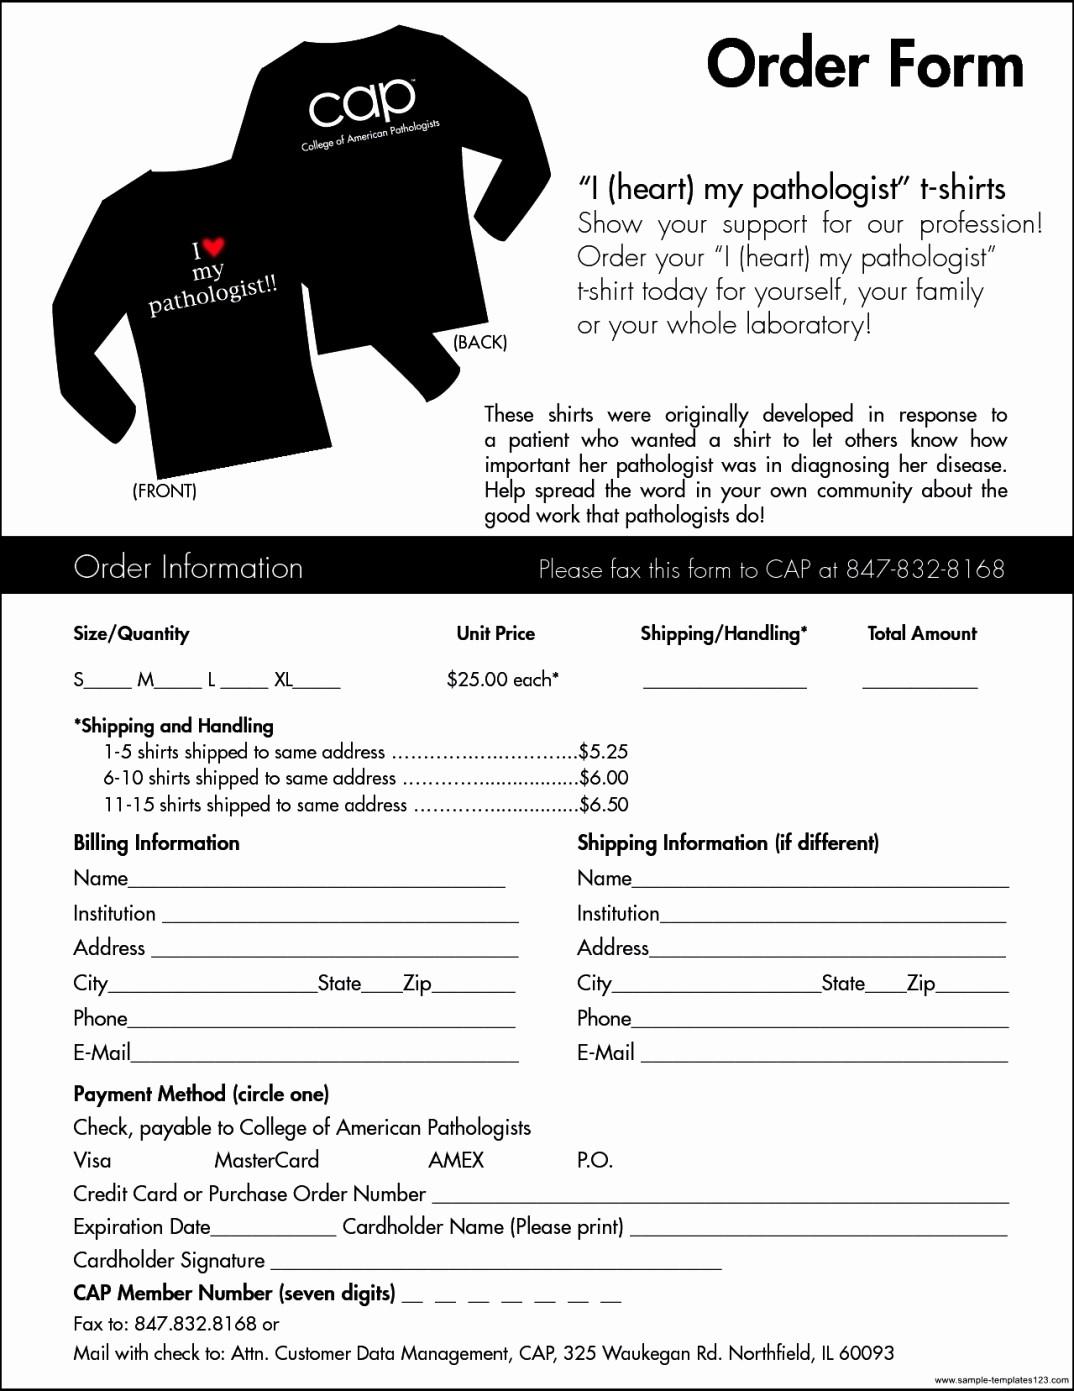 Blank order form Template Word Elegant T Shirt order form Template